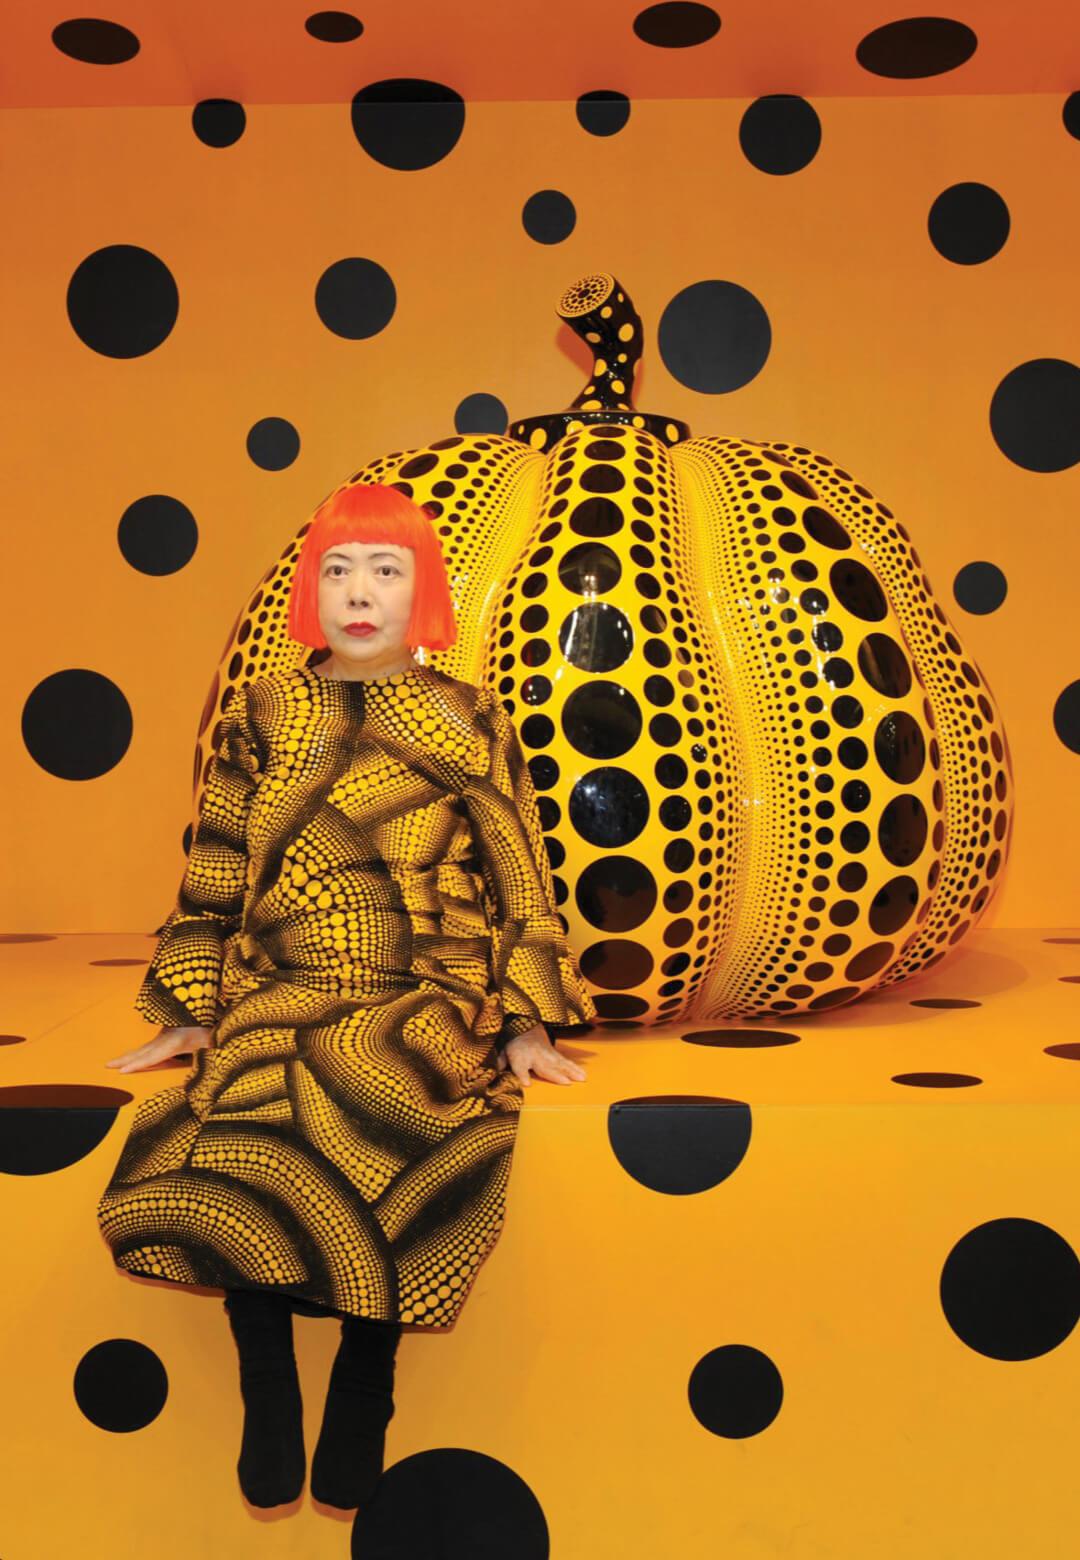 Yayoi Kusama with Pumpkin (2010) | Cosmic Nature | Yayoi Kusama| STIRworld